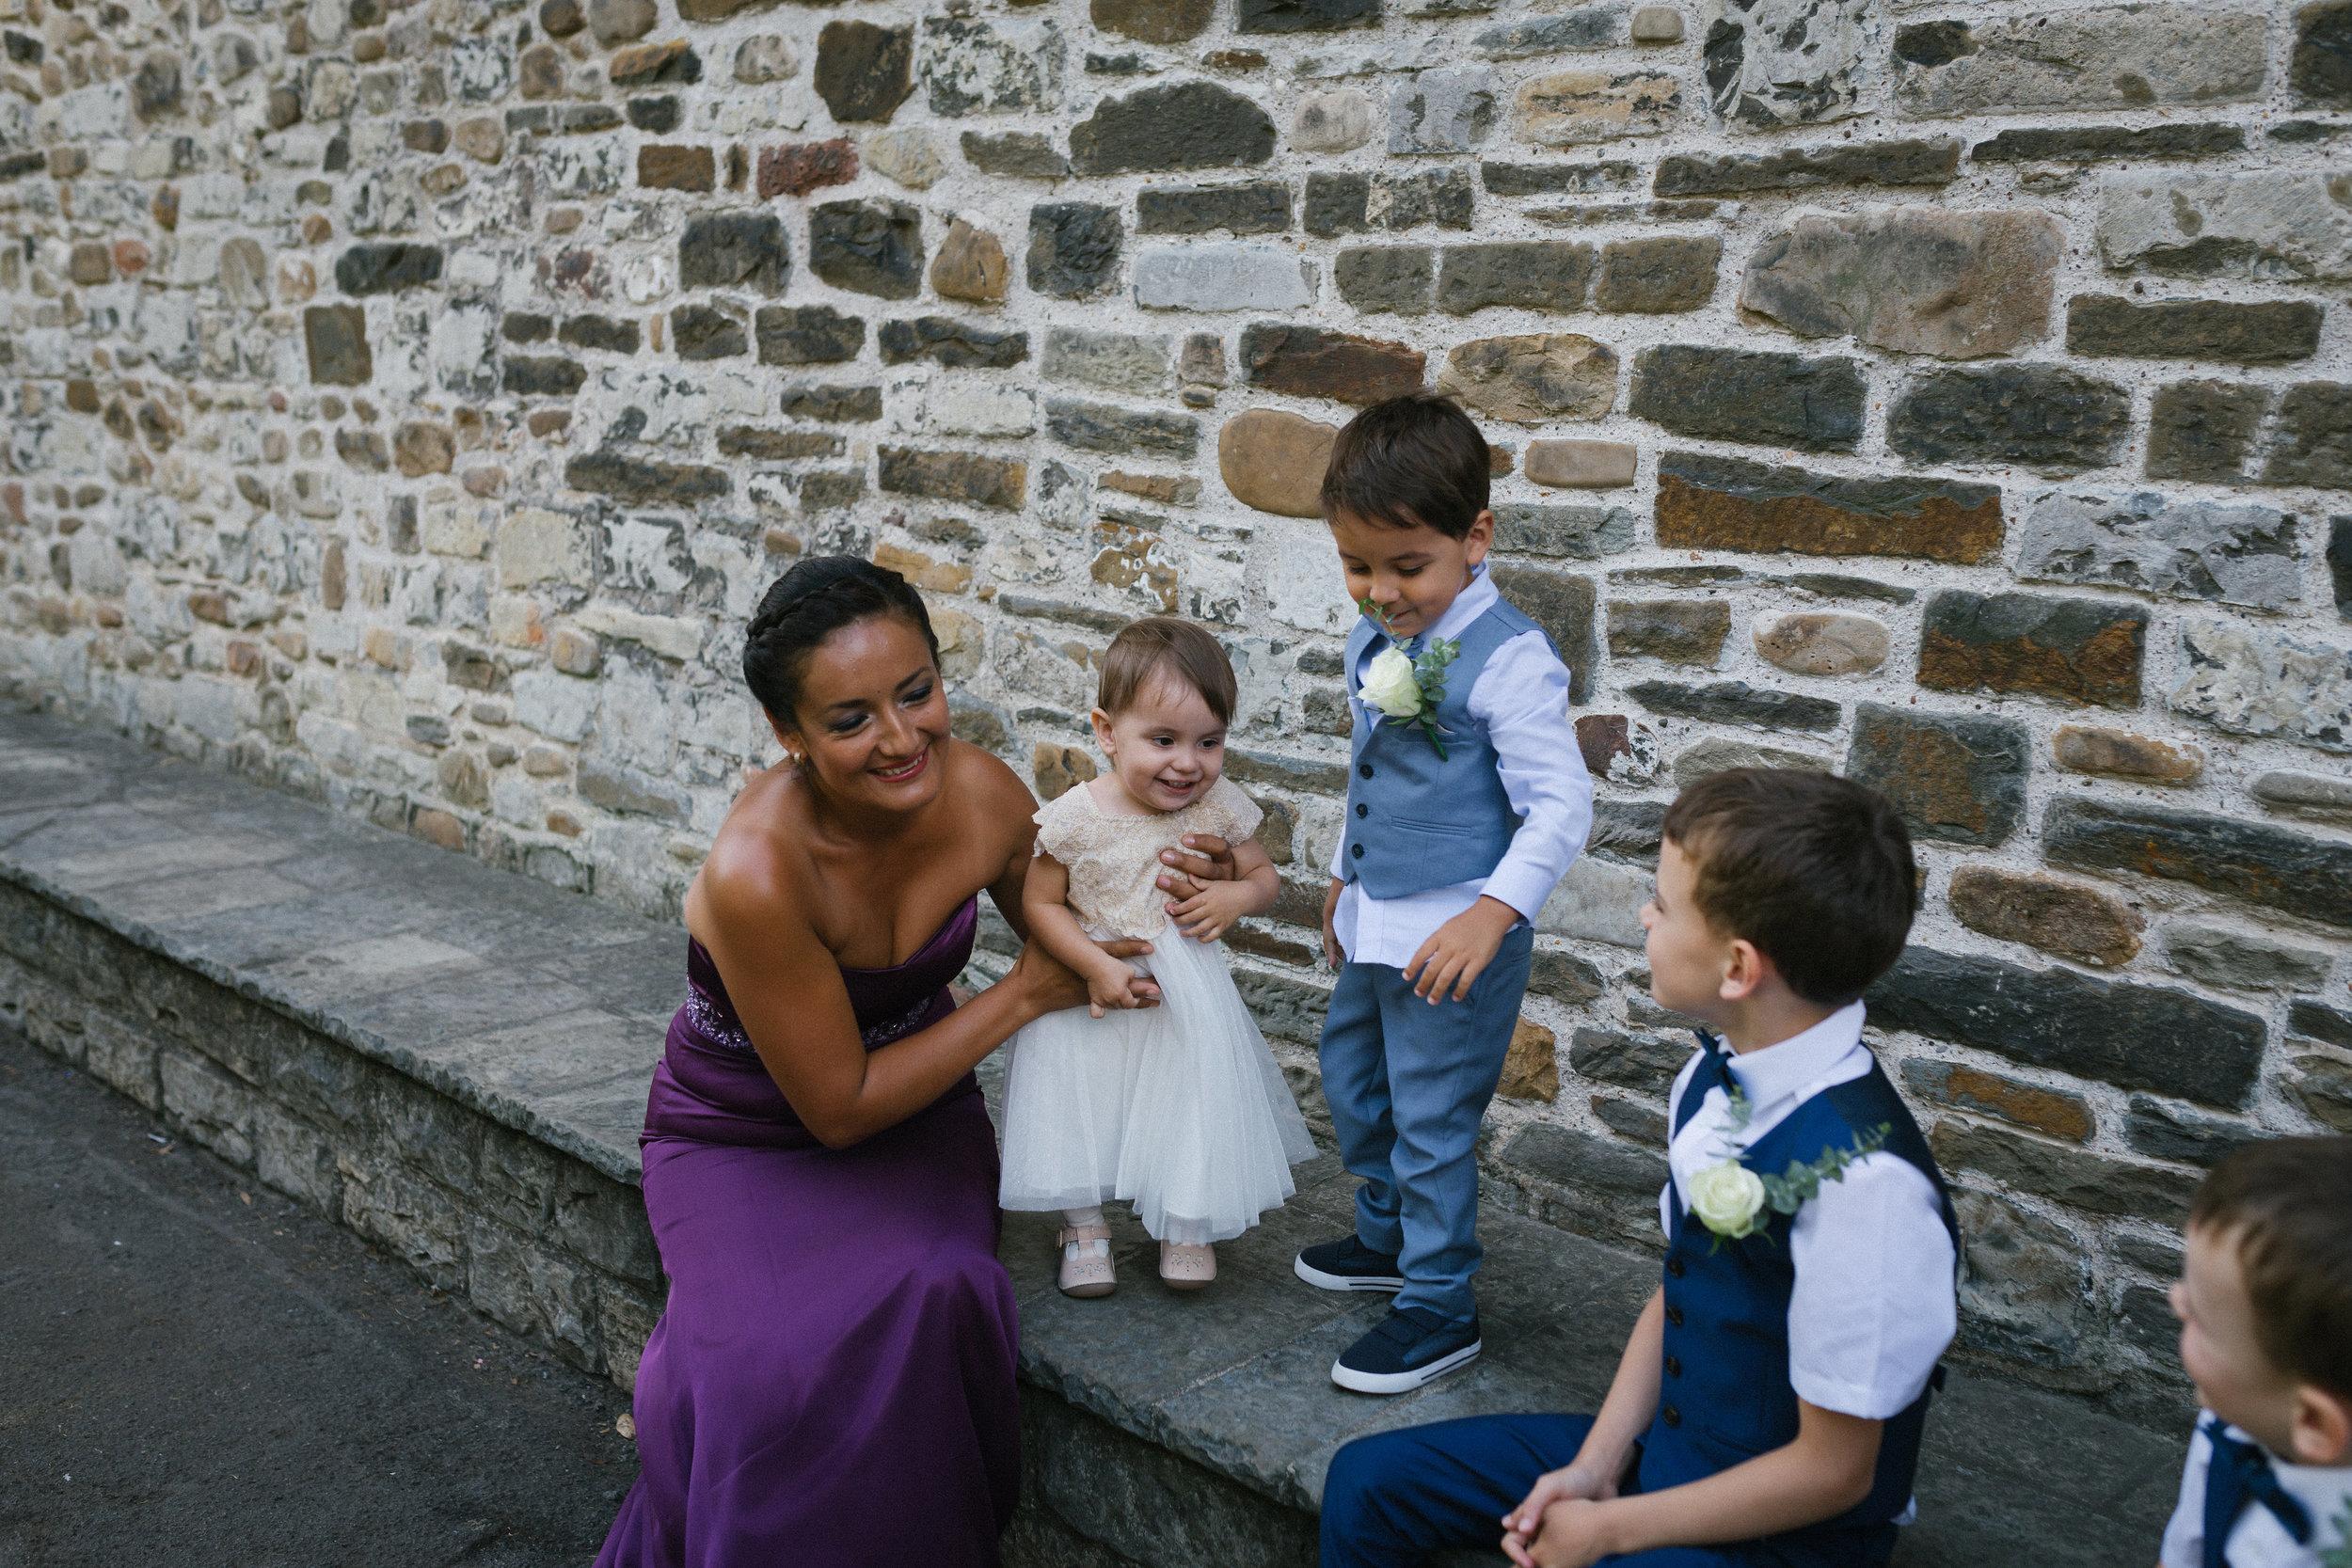 Family enjoying the wedding day